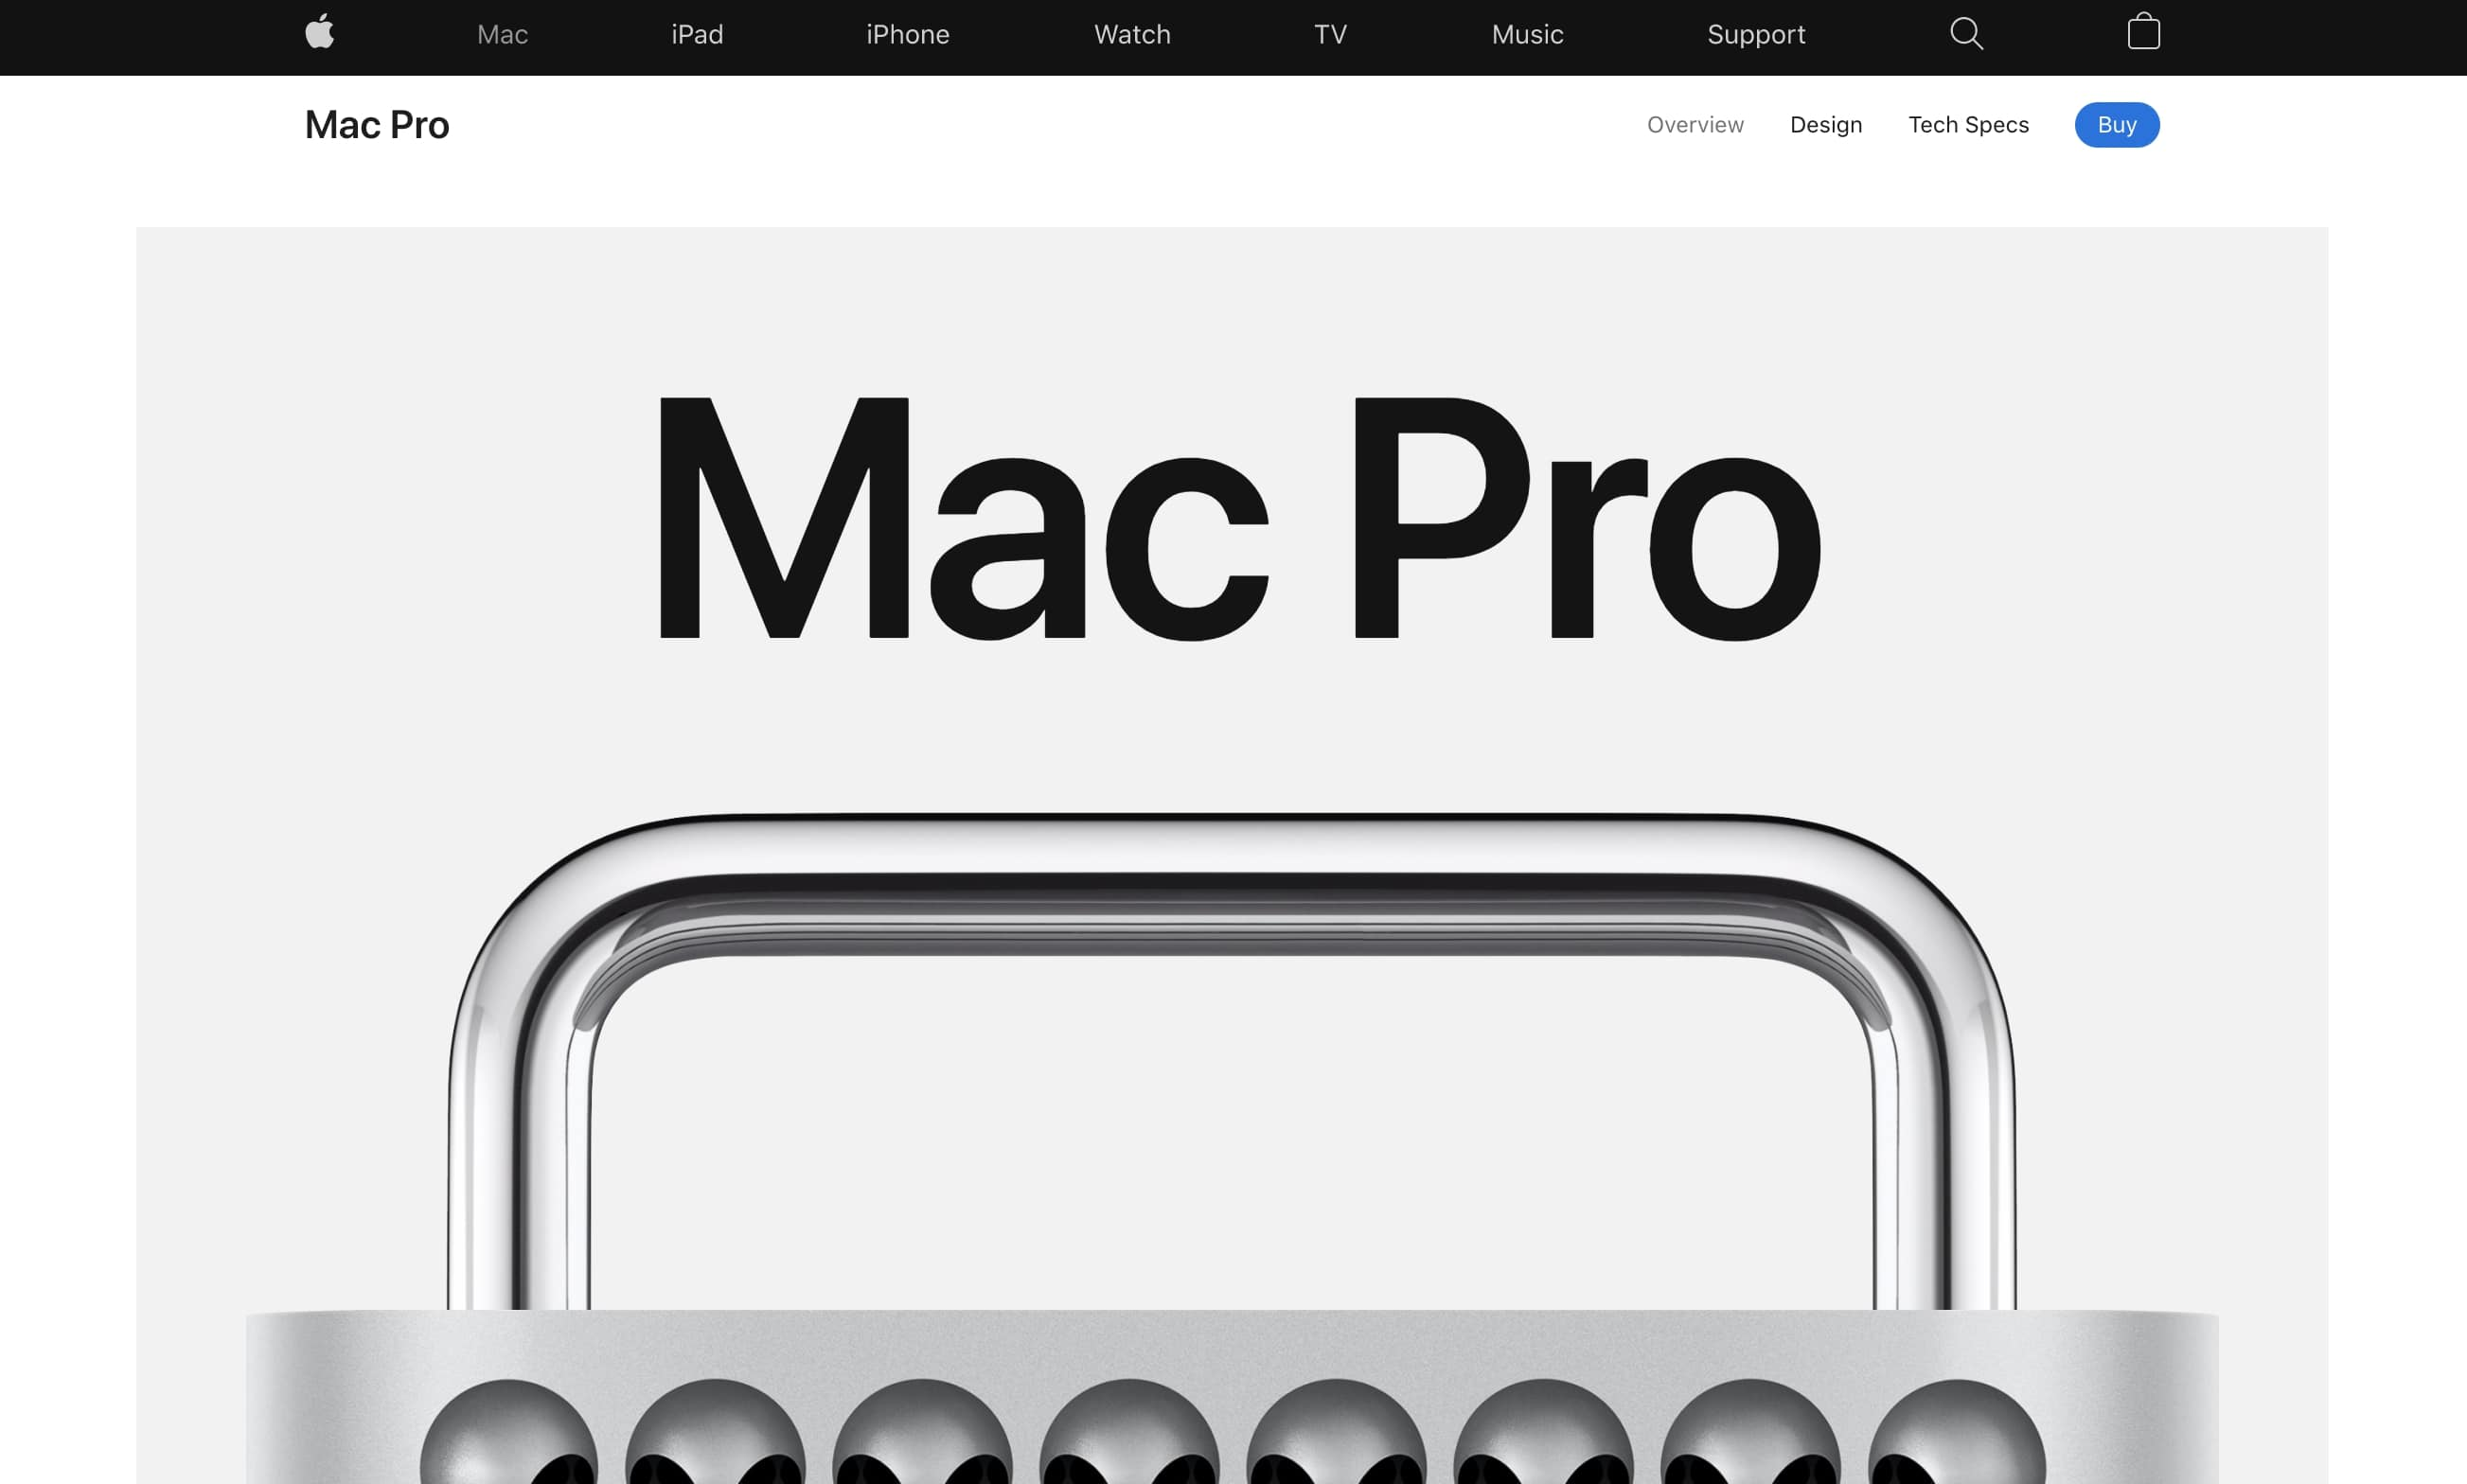 Apple's Mac Pro landing page